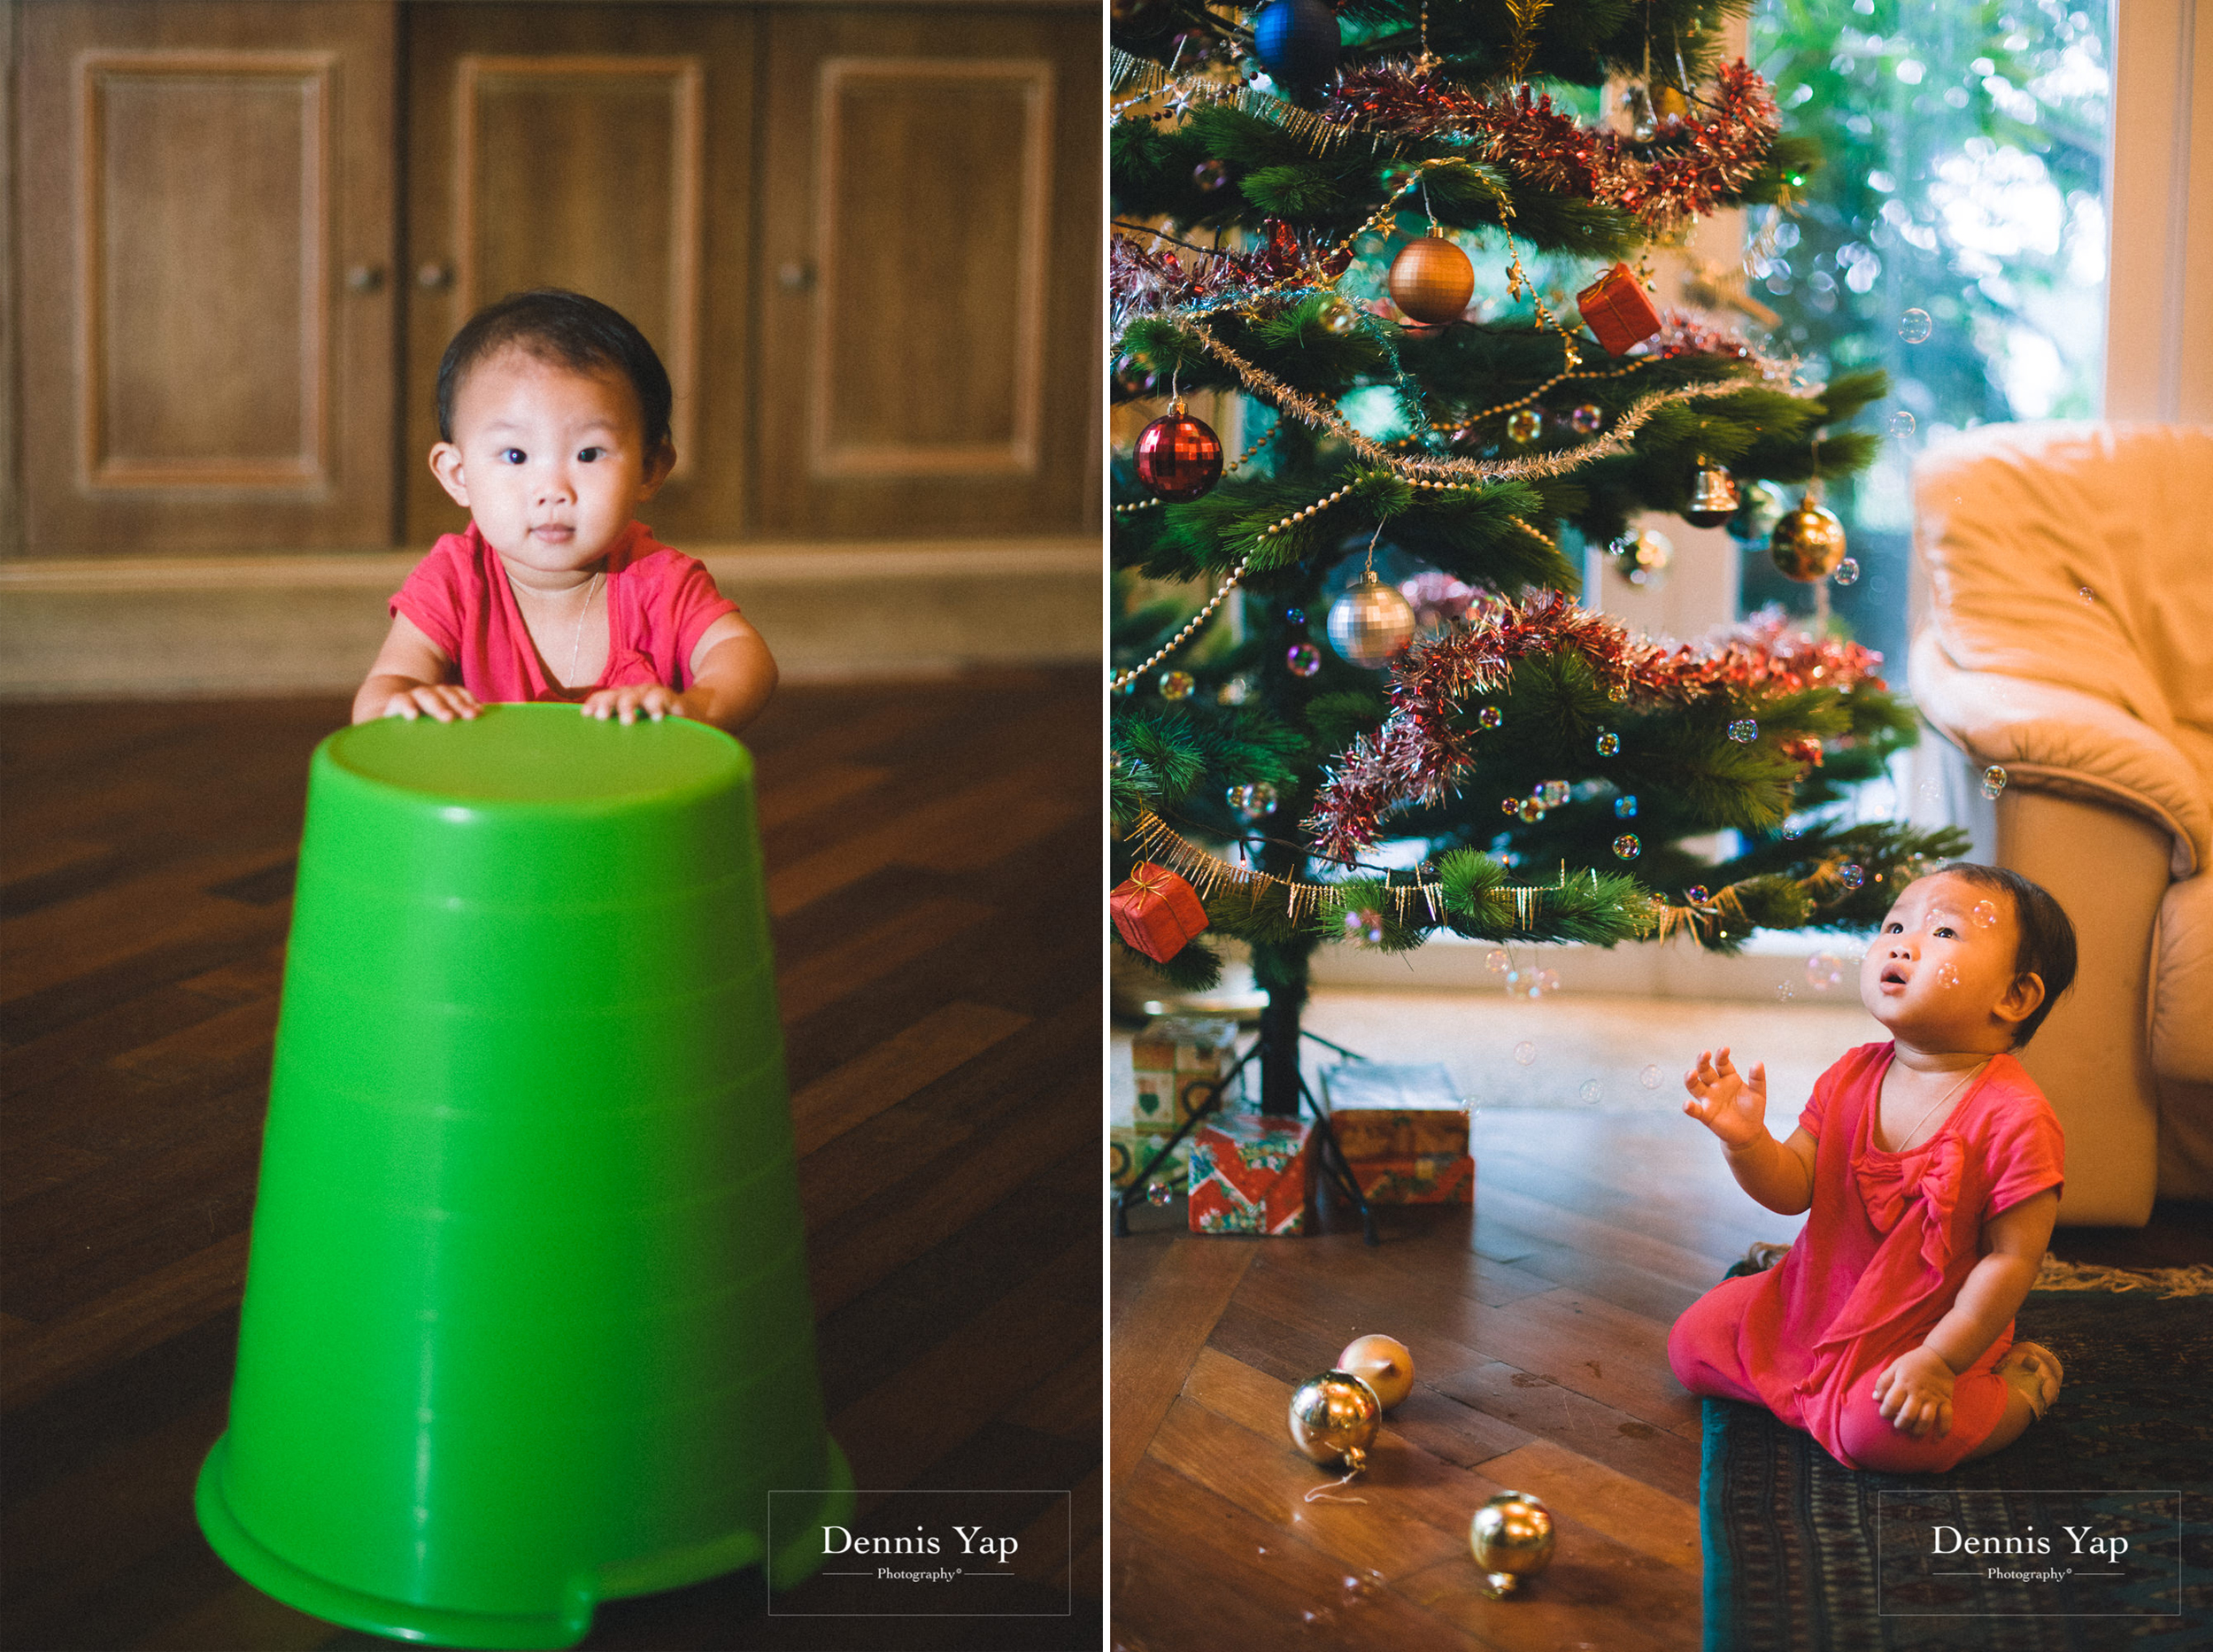 thong family chuen thong portrait beloved dennis yap photography-9.jpg